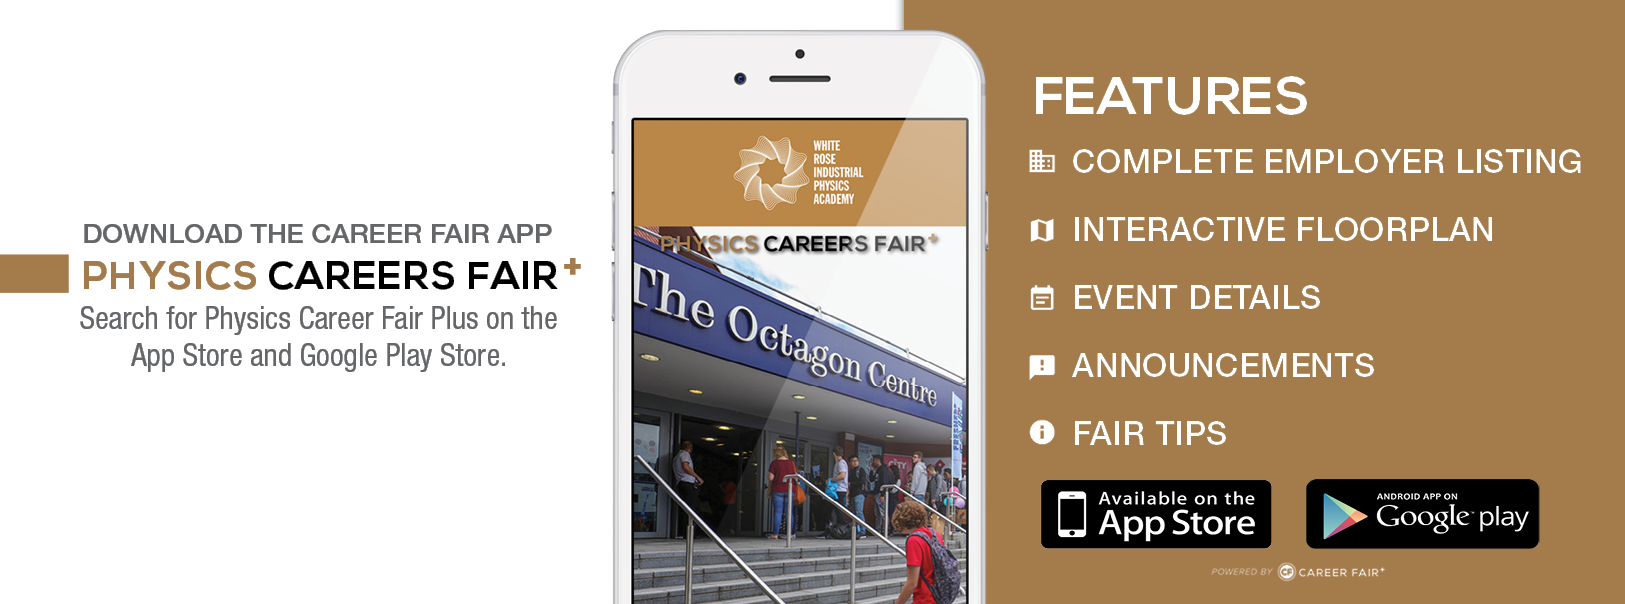 Careers fair App information